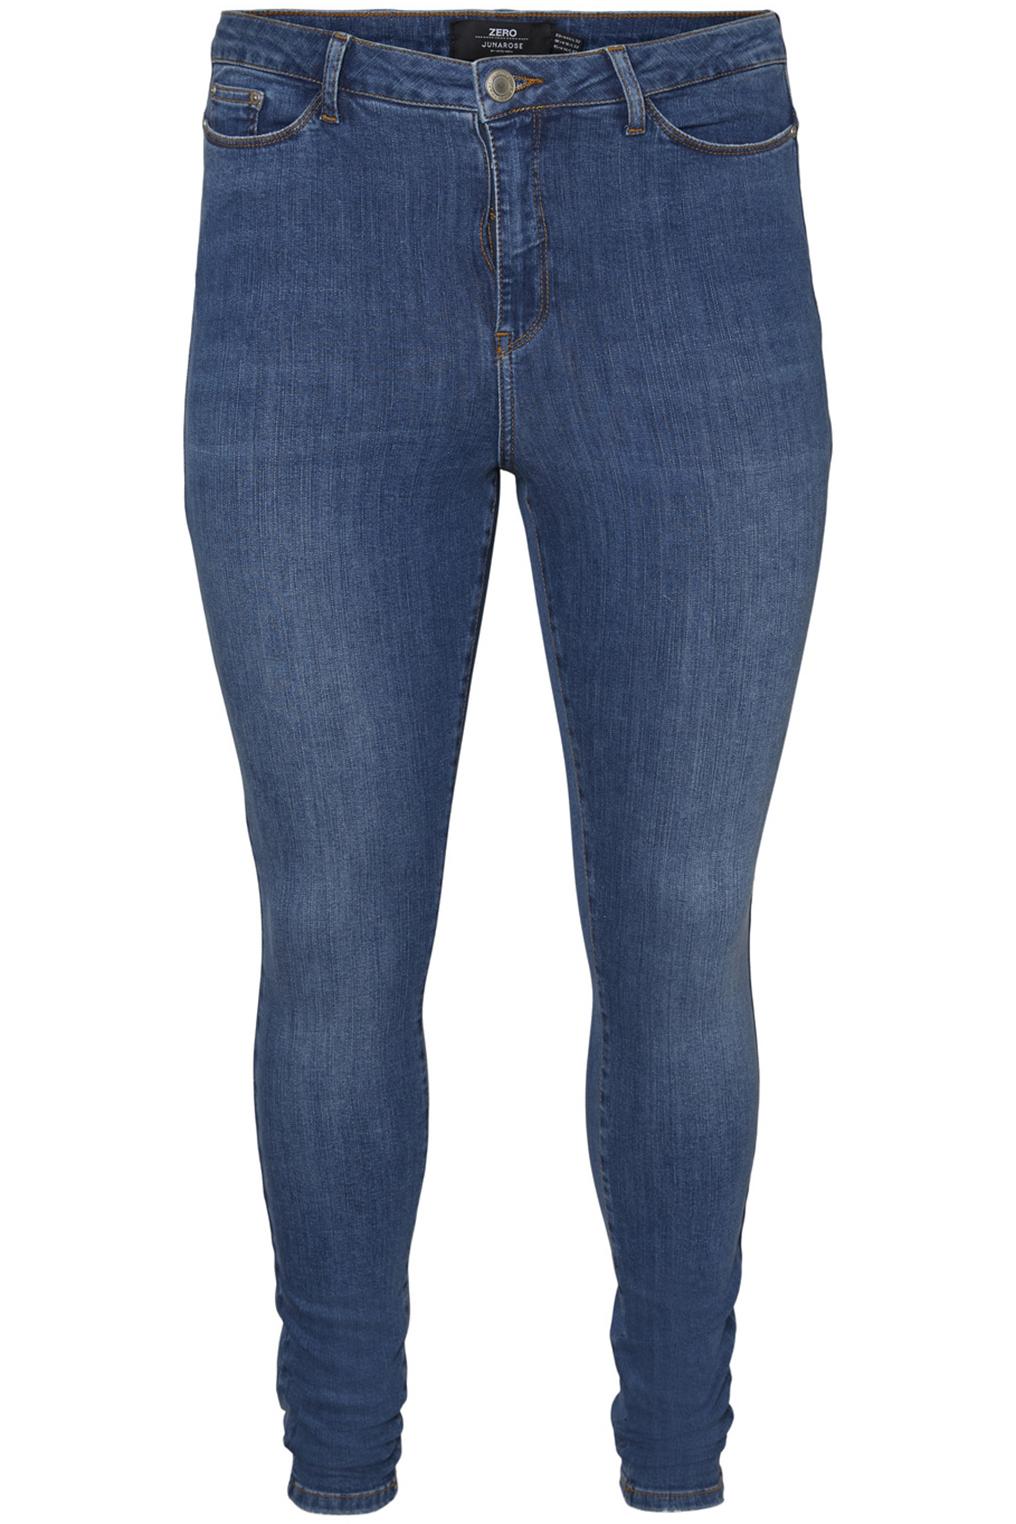 Jeans ZERO Junarose skinny fit